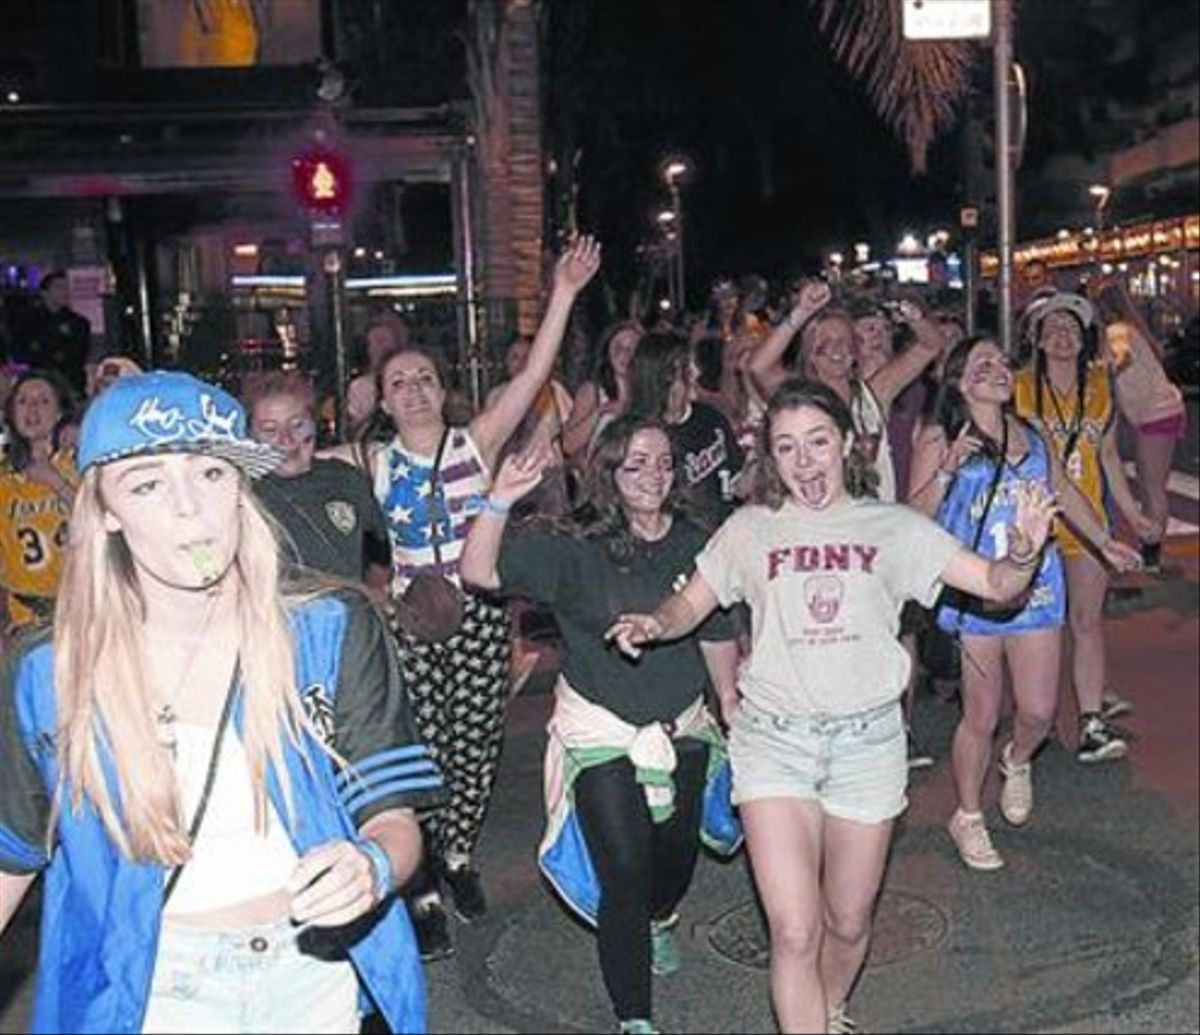 Grupo de chicas demarcha nocturnapor Salou.